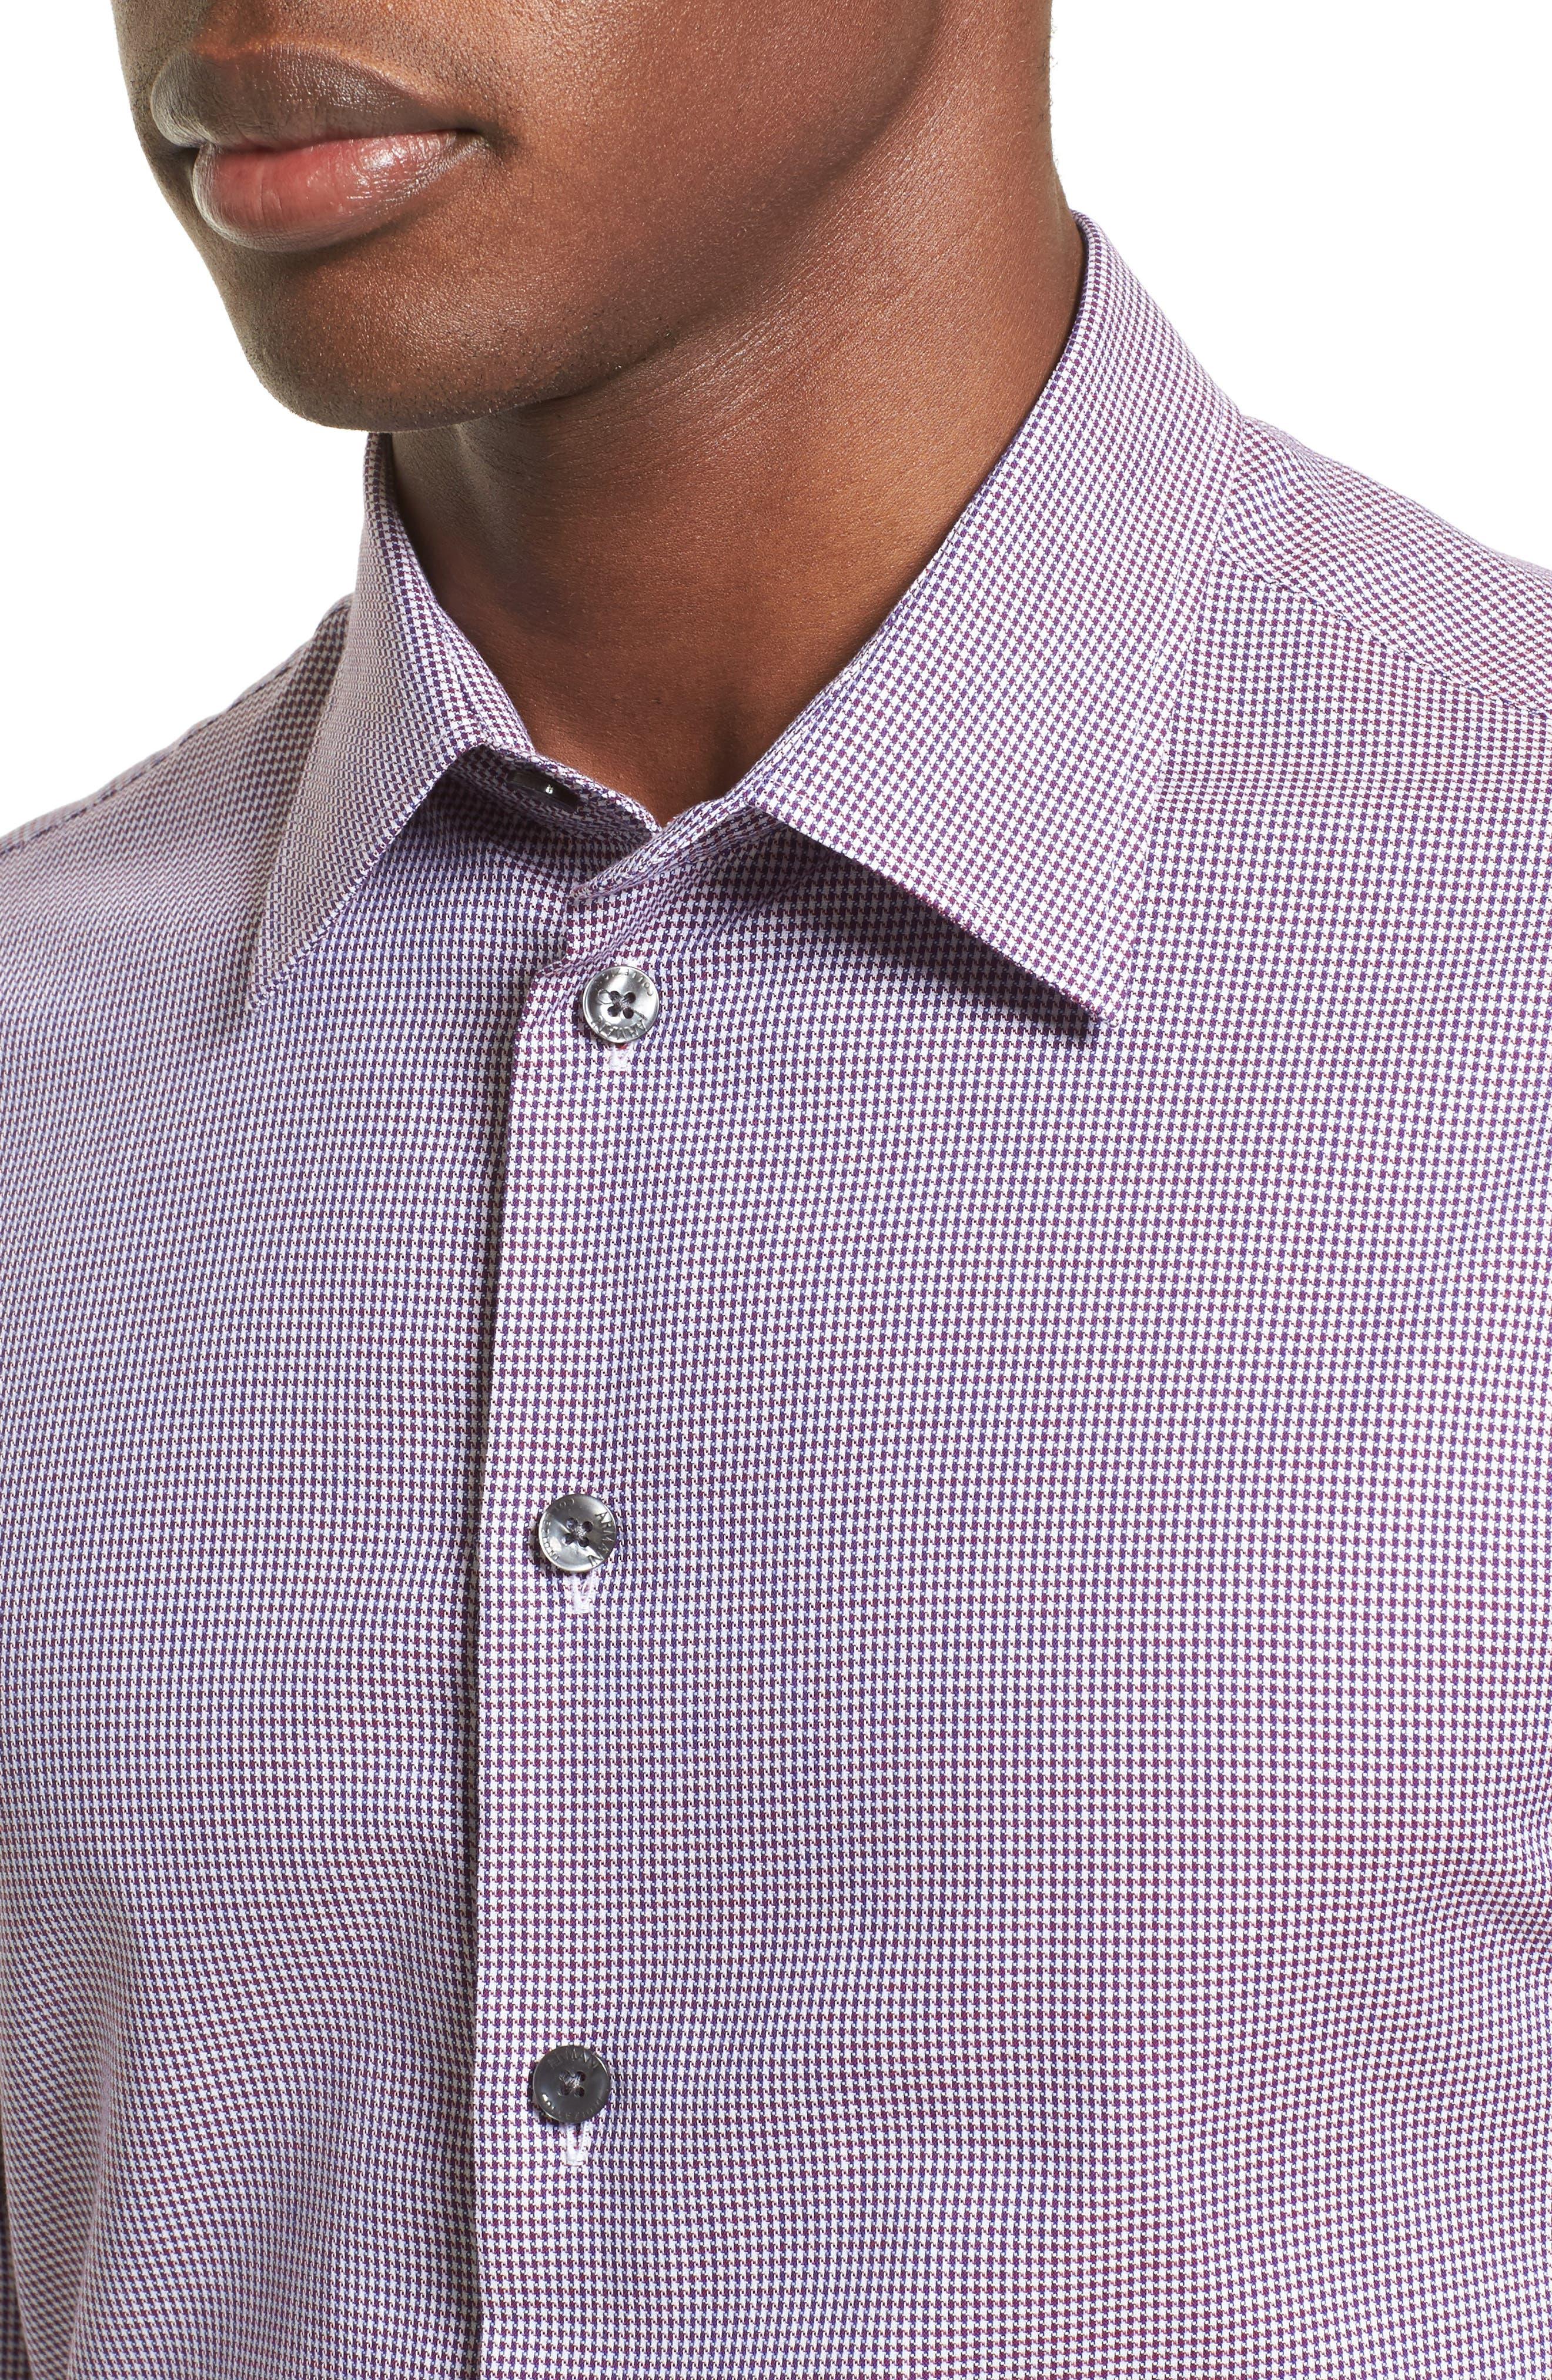 Regular Fit Houndstooth Sport Shirt,                             Alternate thumbnail 4, color,                             020